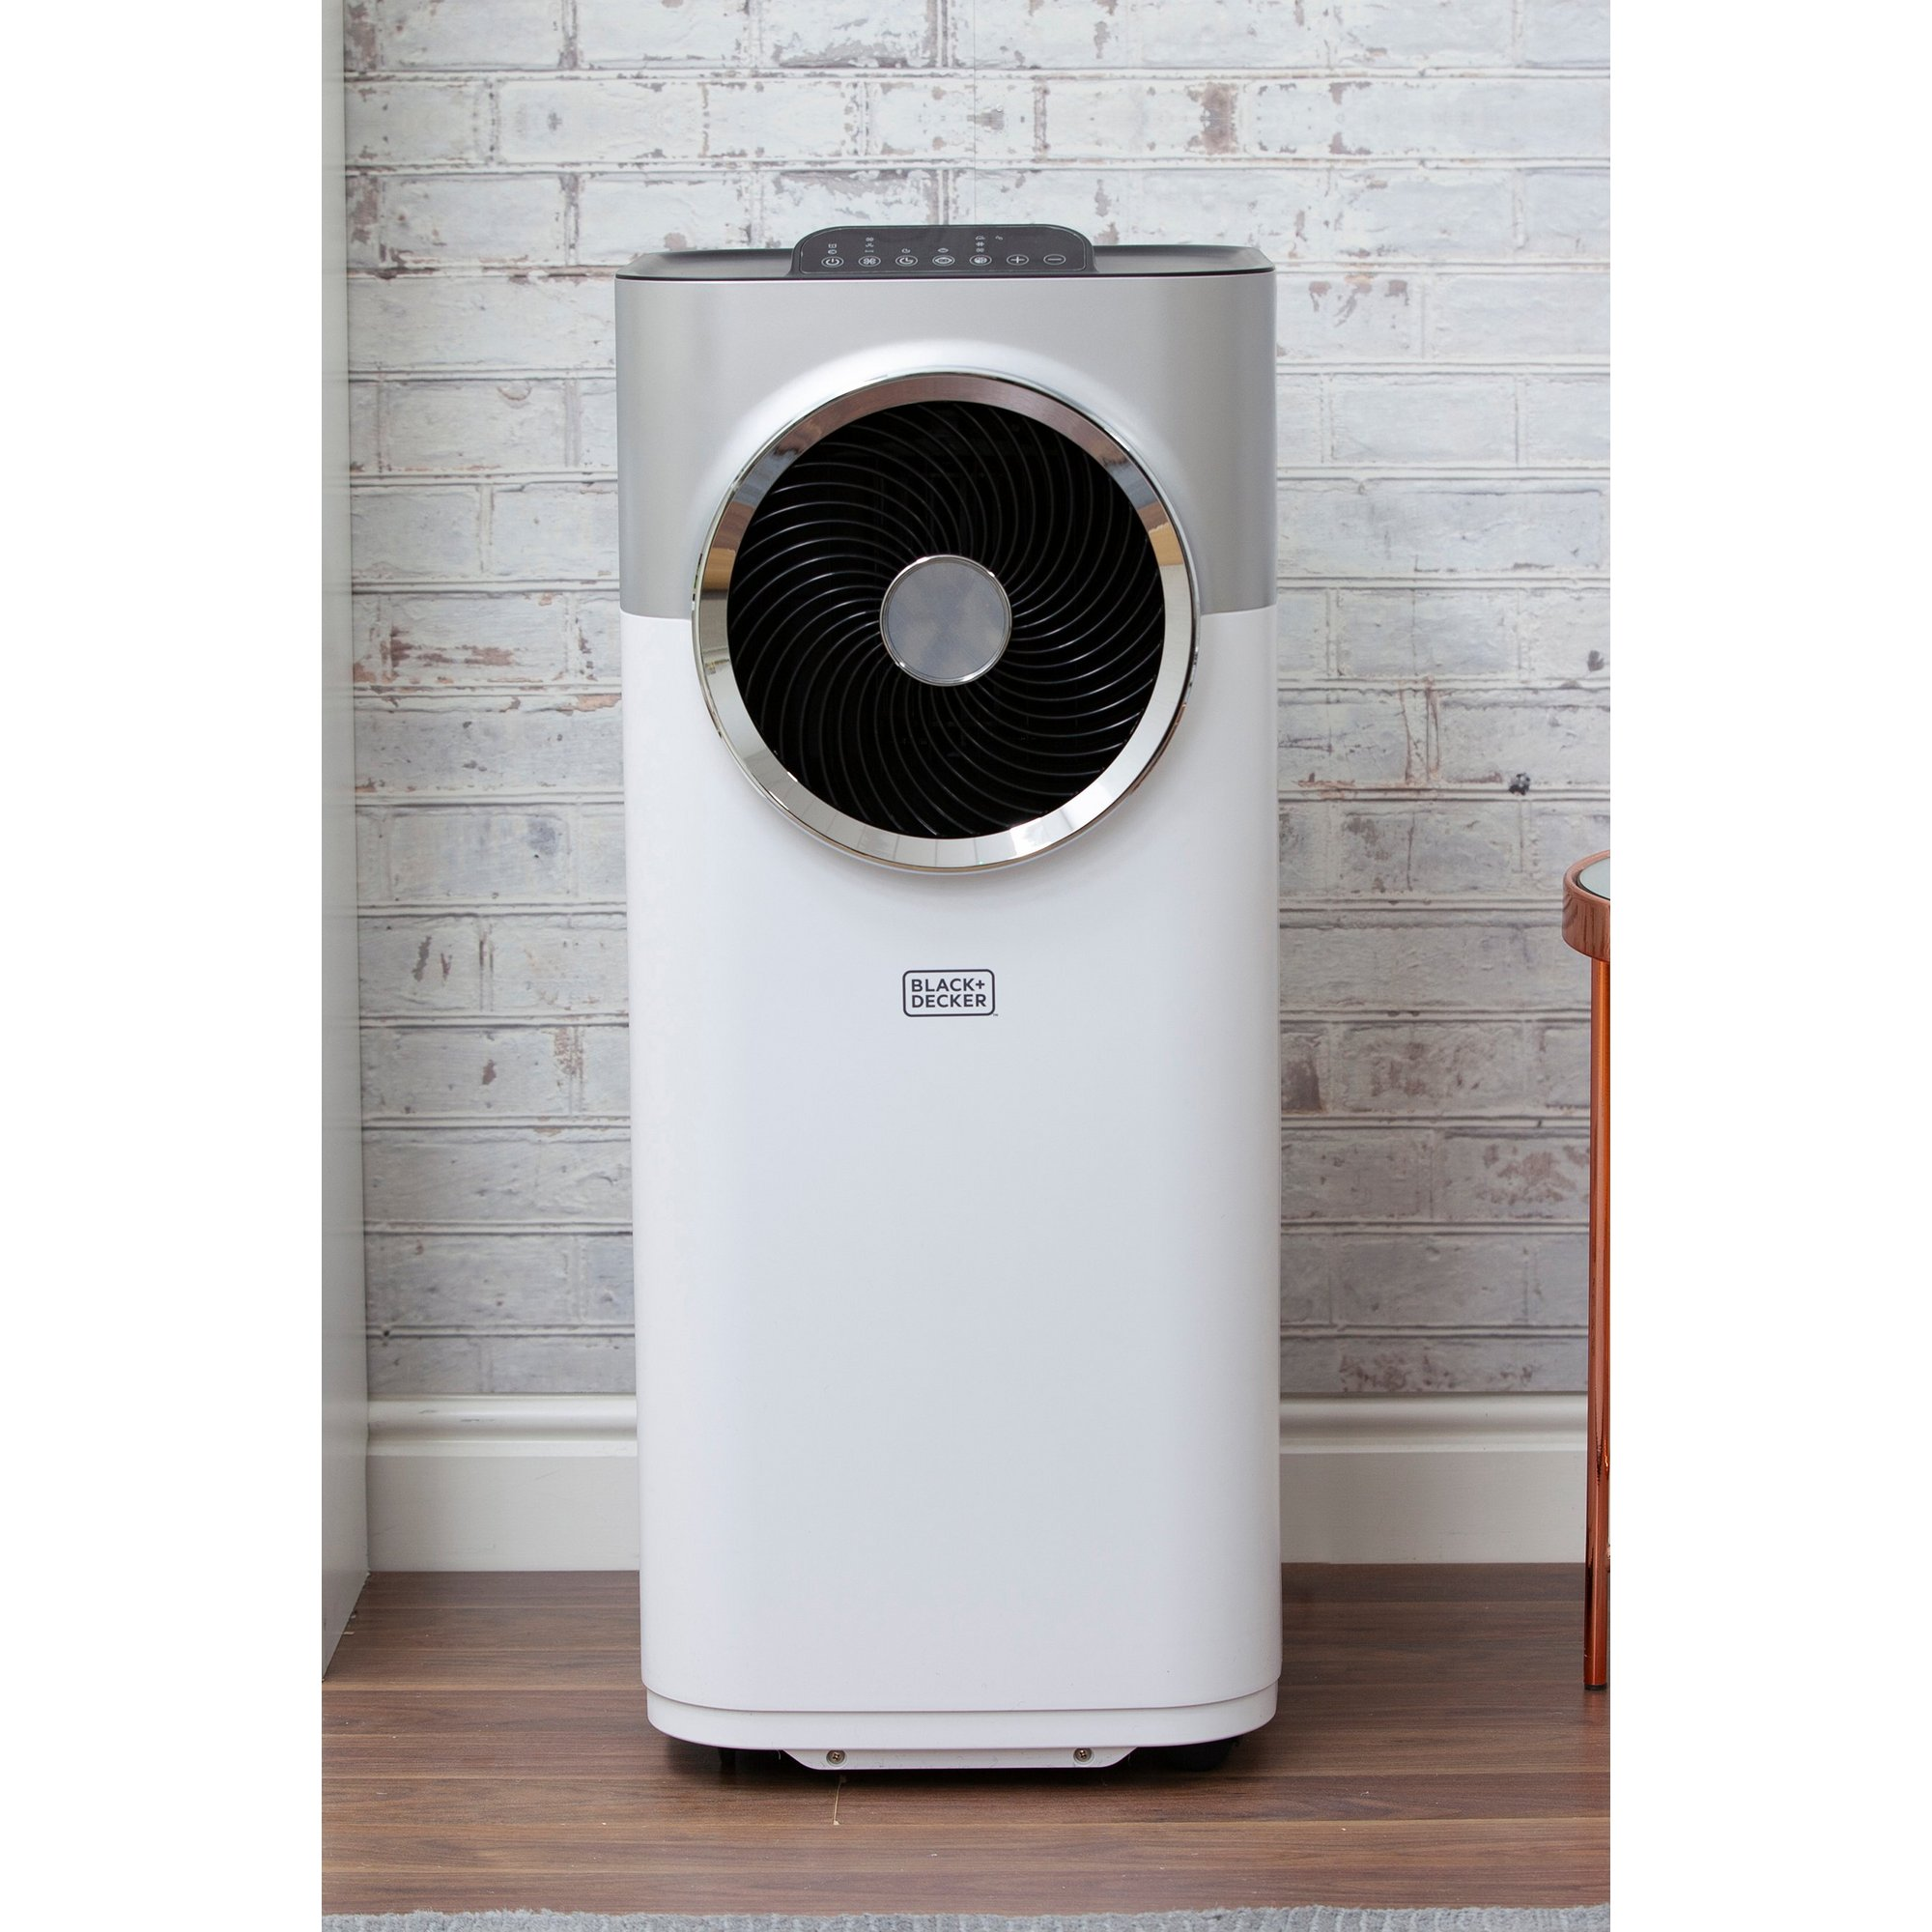 Image of Black and Decker 12000 BTU Air Conditioner